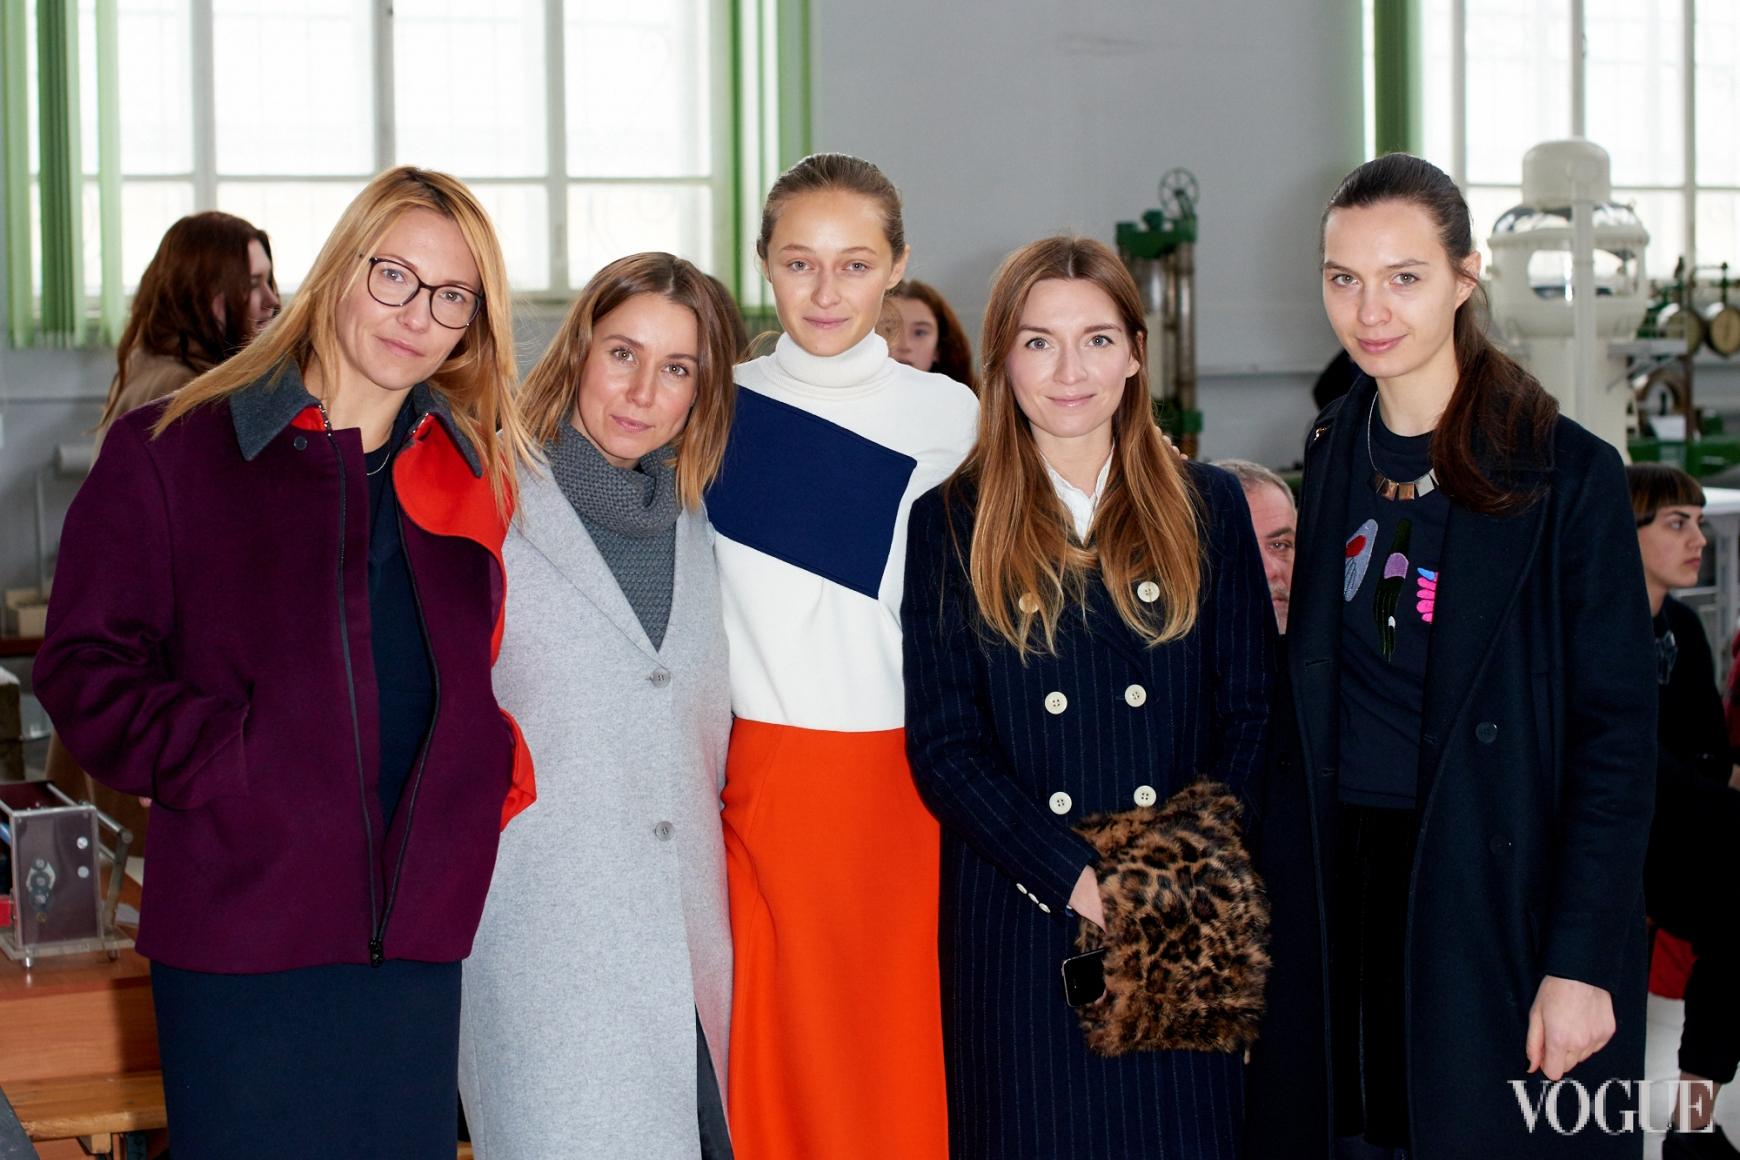 Зинаида Лихачева, Александра Бородина, Дарья Шаповалова, Елена Пащенко, Наталья Моденова